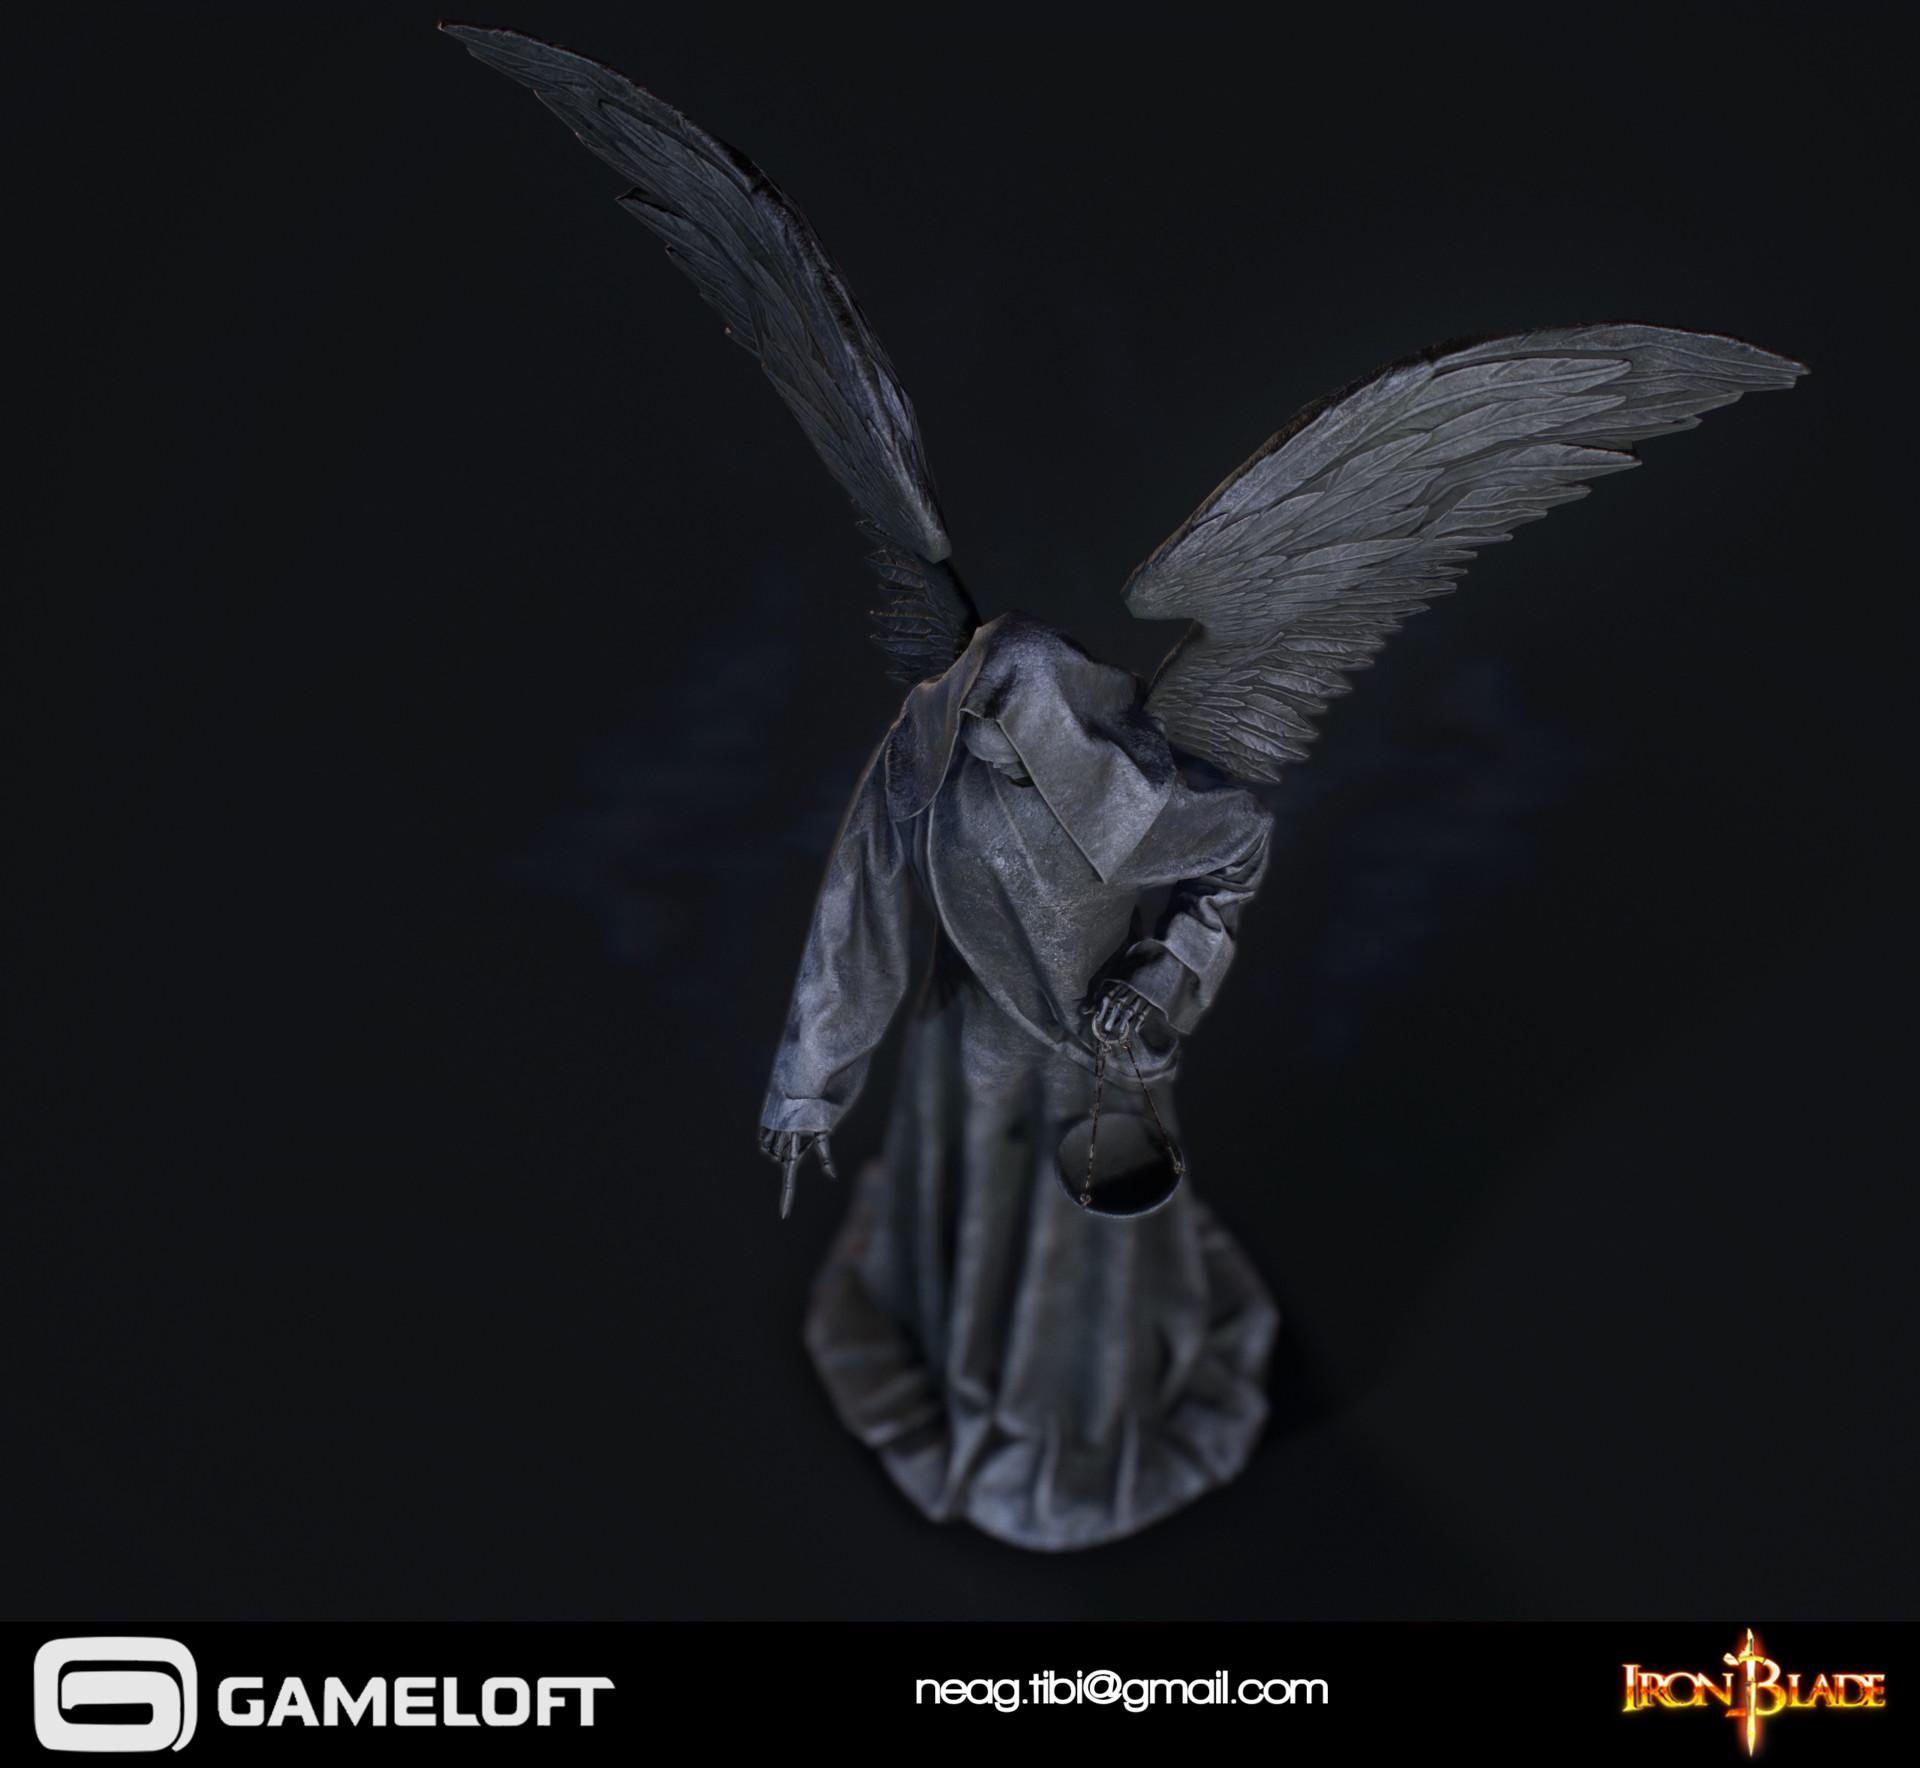 Tibi neag tibi neag iron blade death statue low poly 03